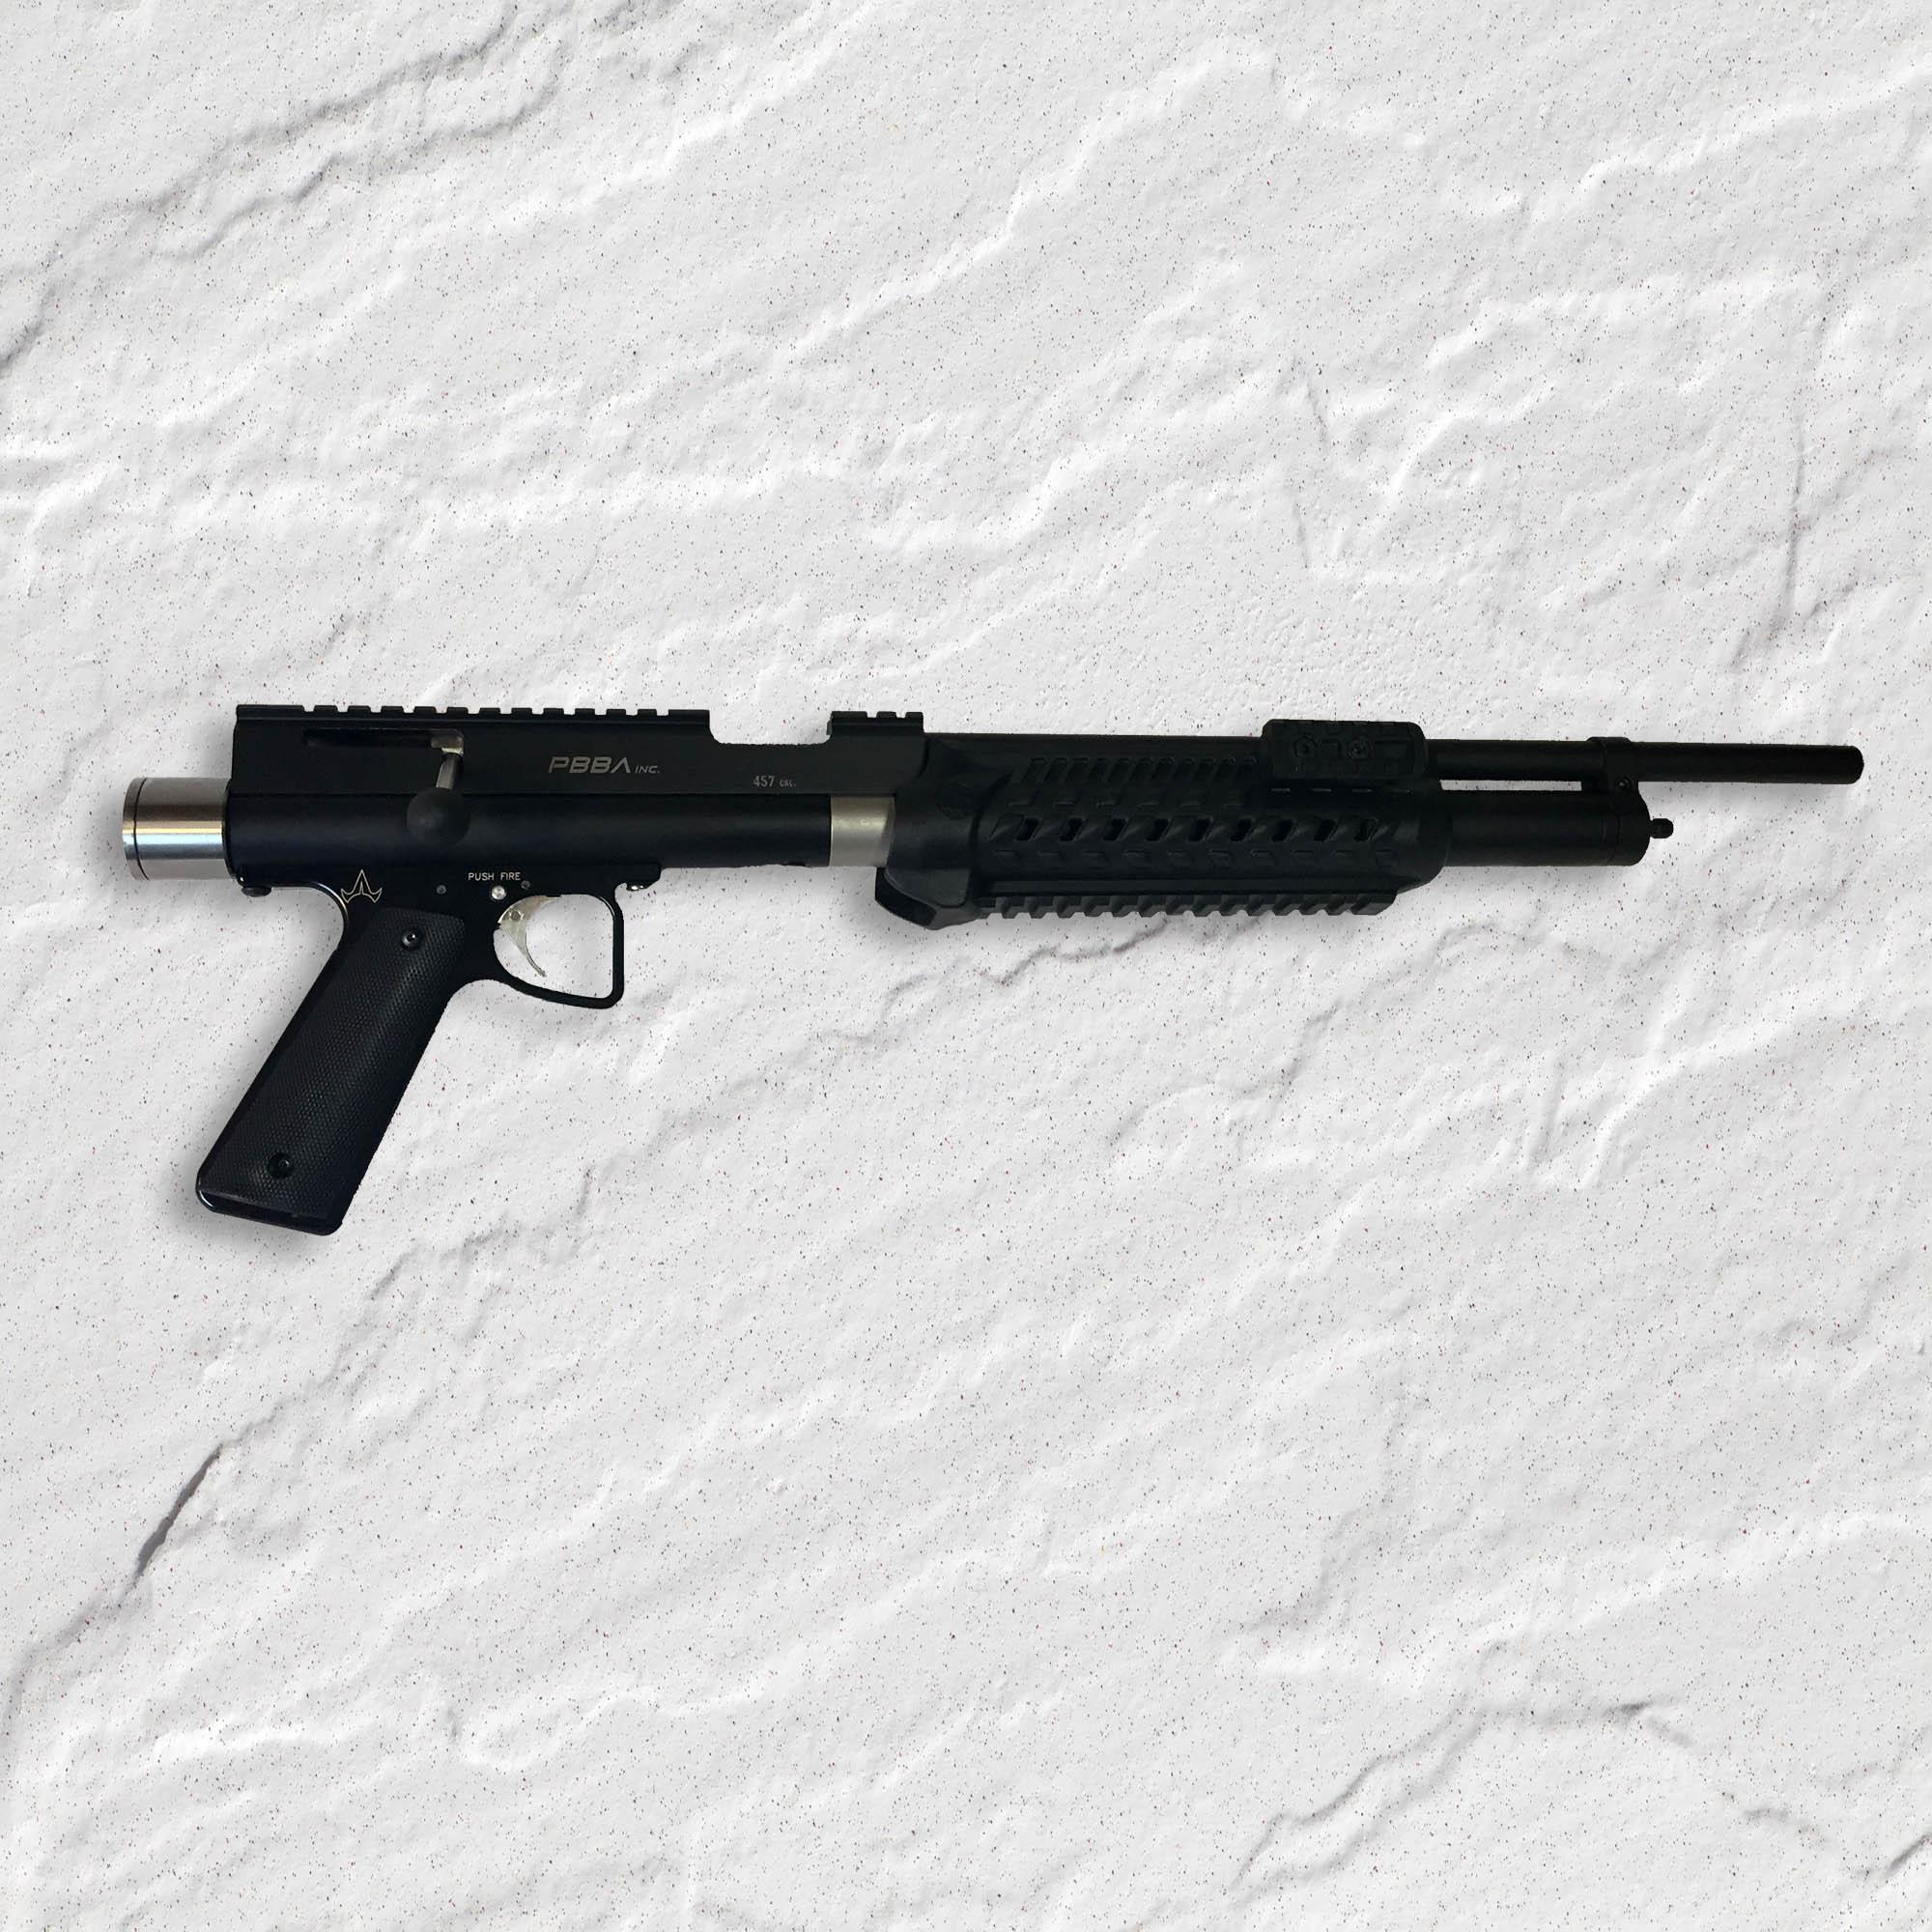 Pro Ar Air Pistol Hunting Big Bore Air Guns By Pbba Inc